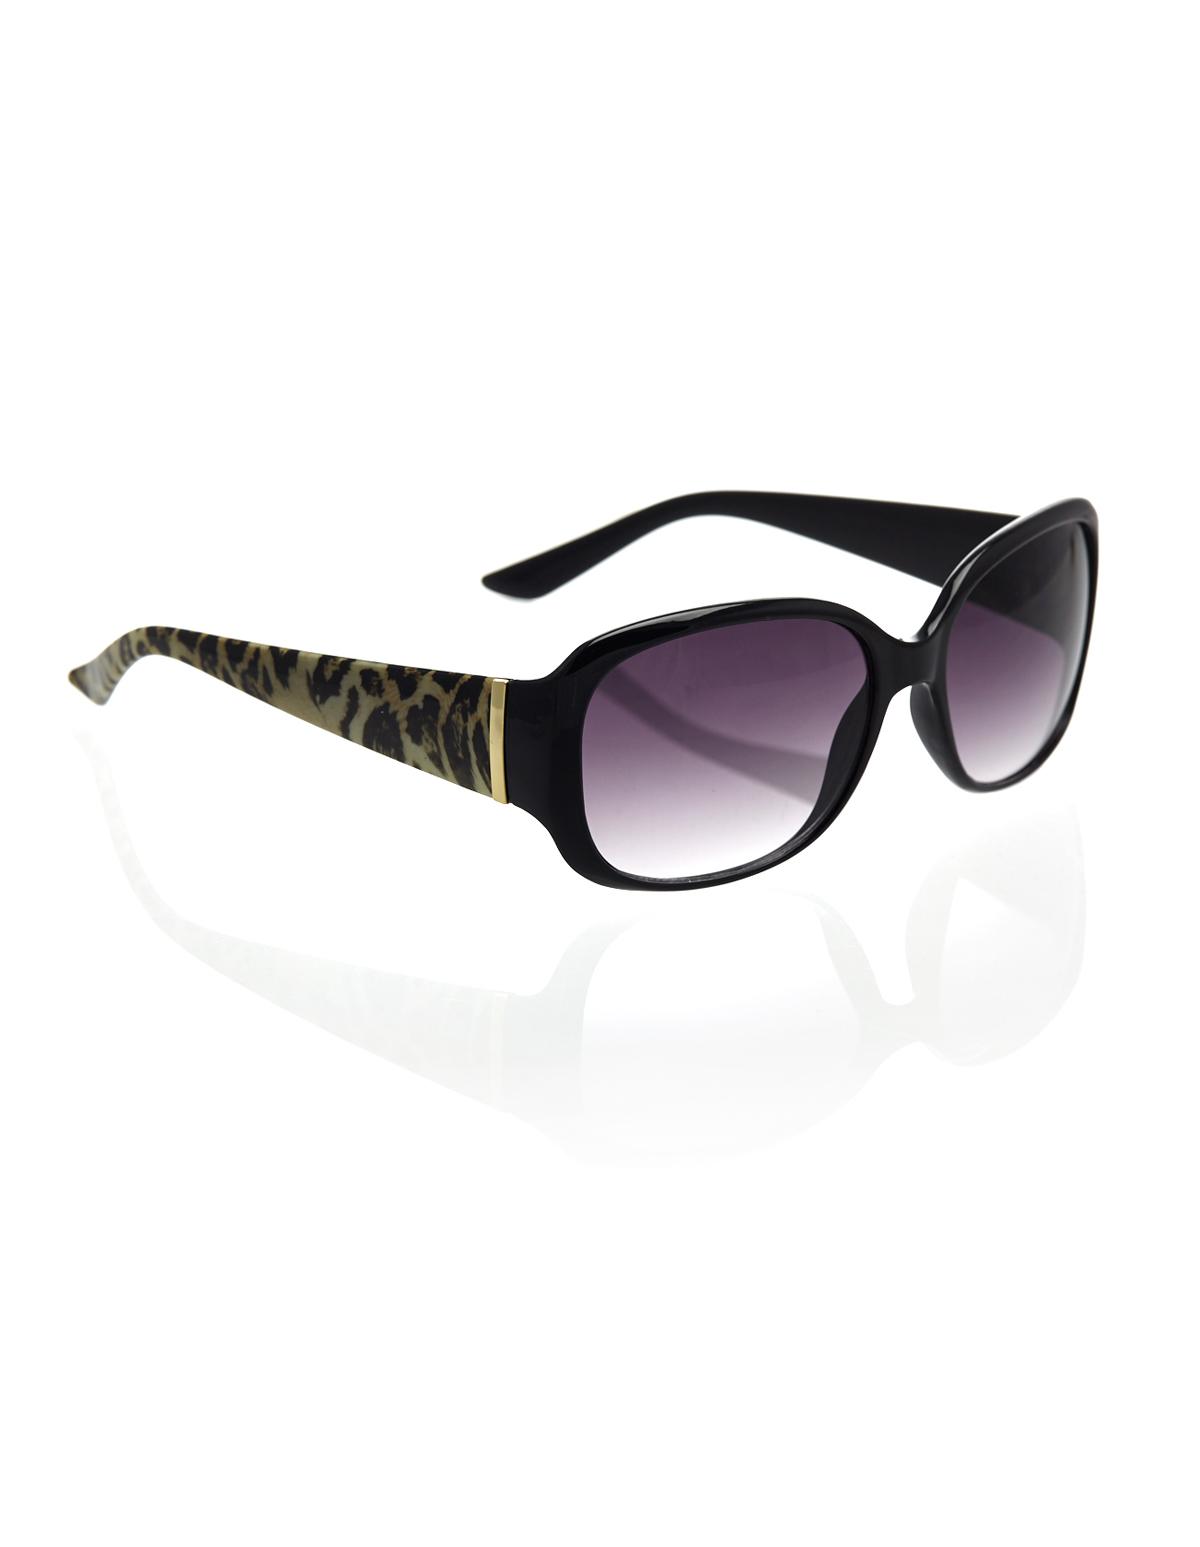 Black Small Frame Sunglasses   Cleo